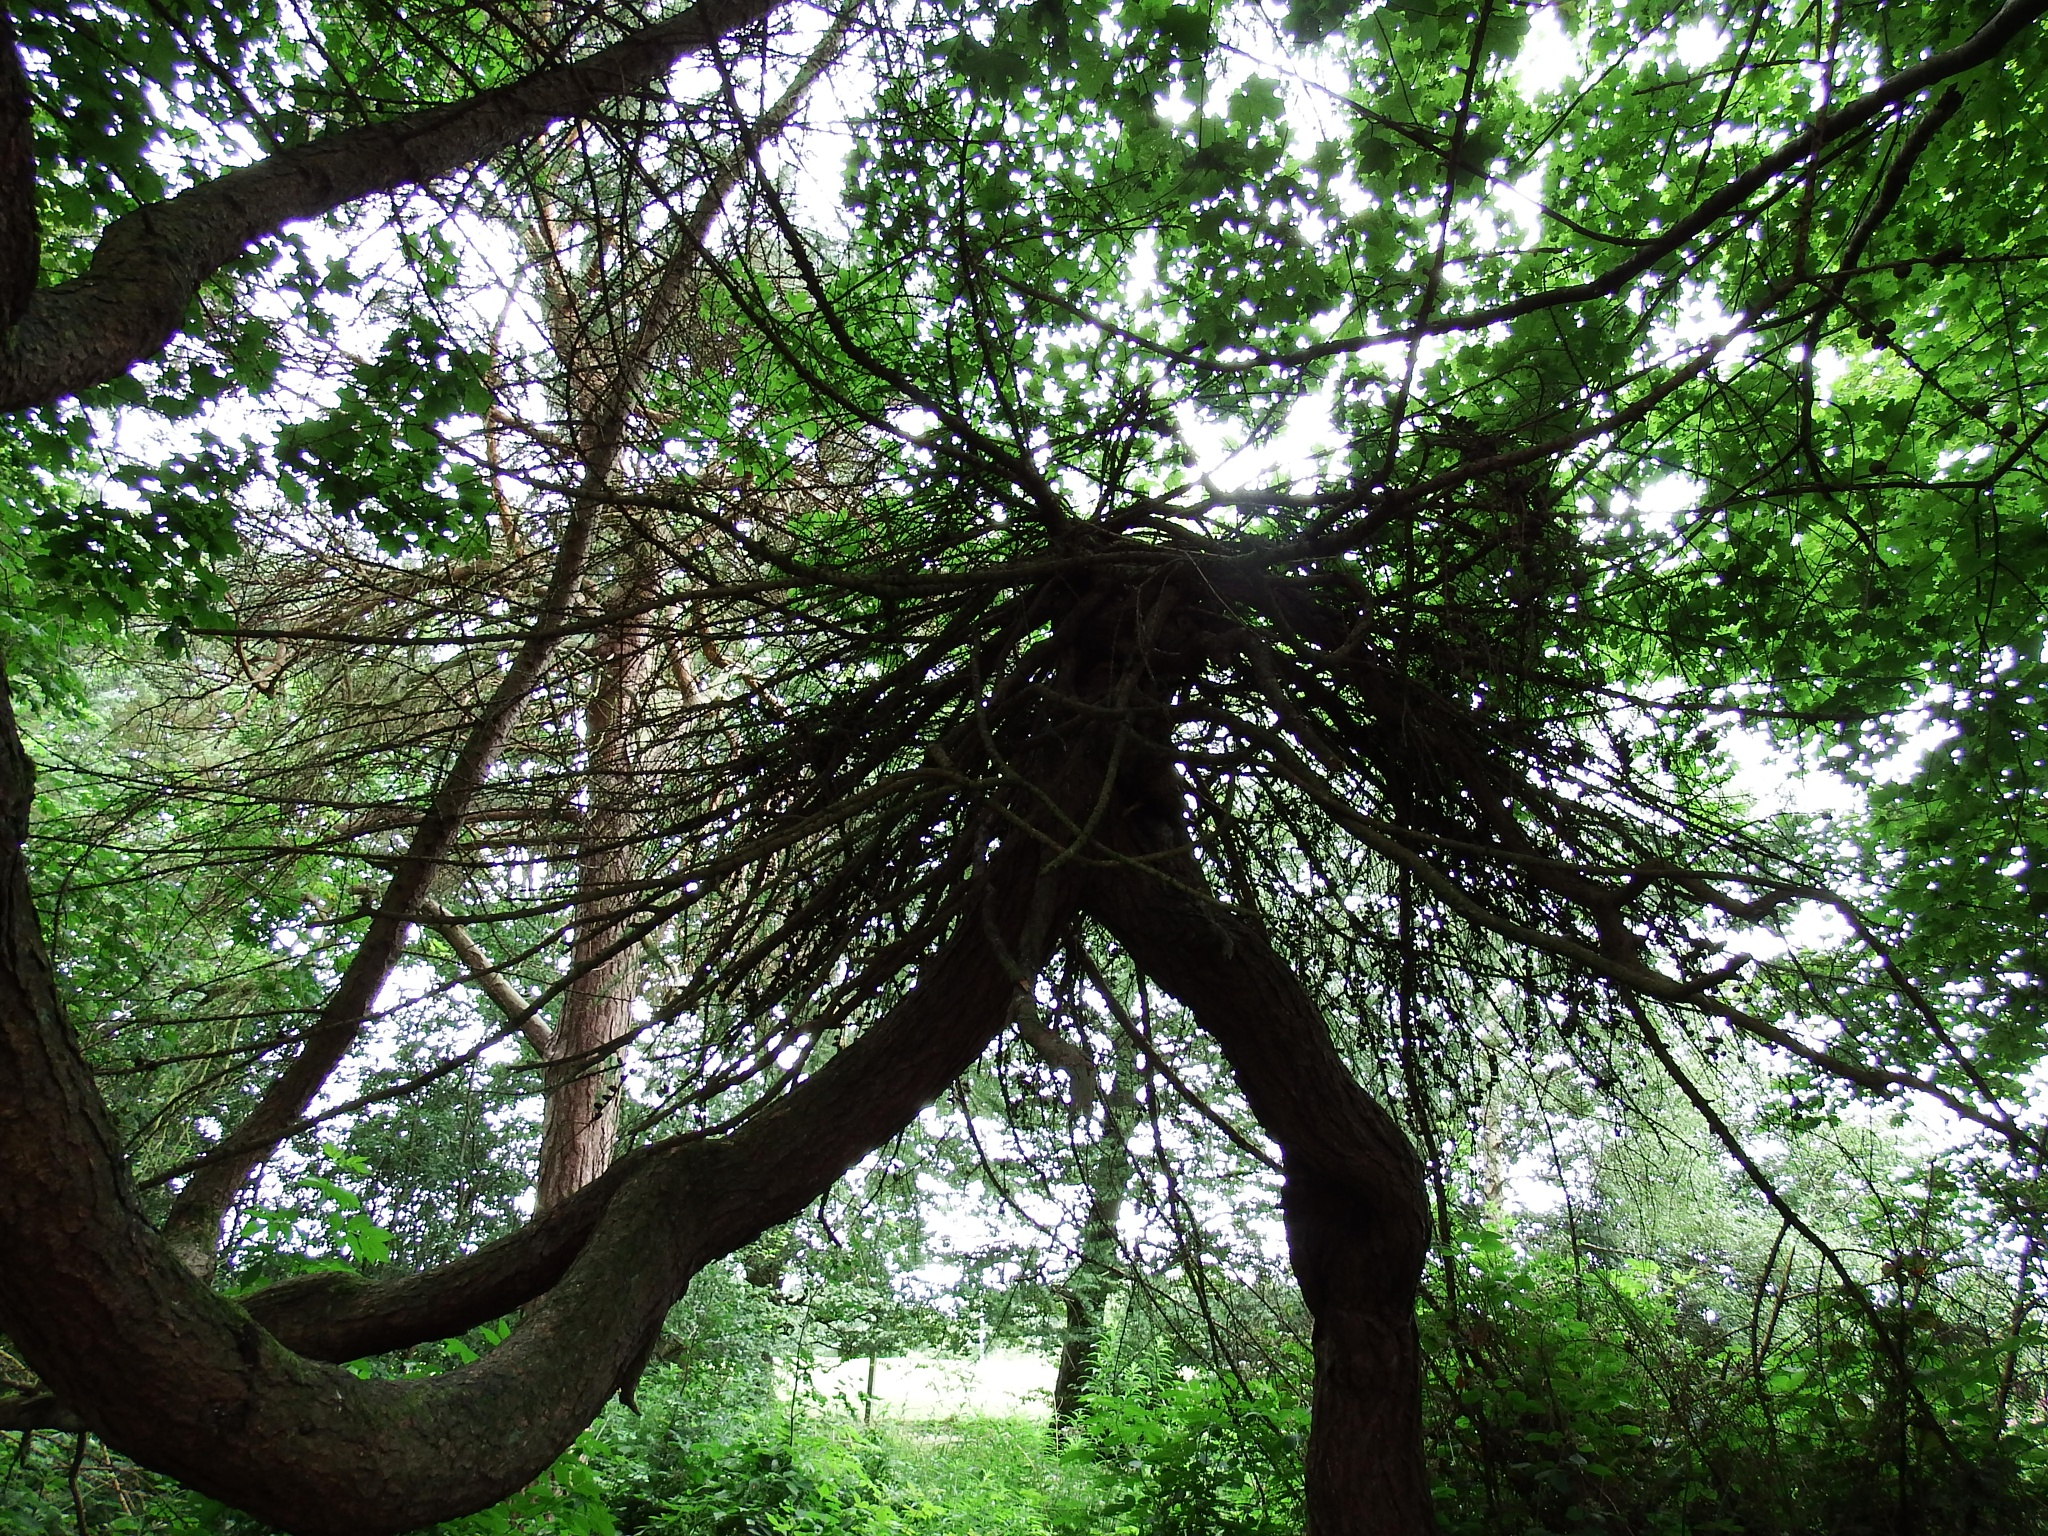 weirdest shaped tree  by seannel